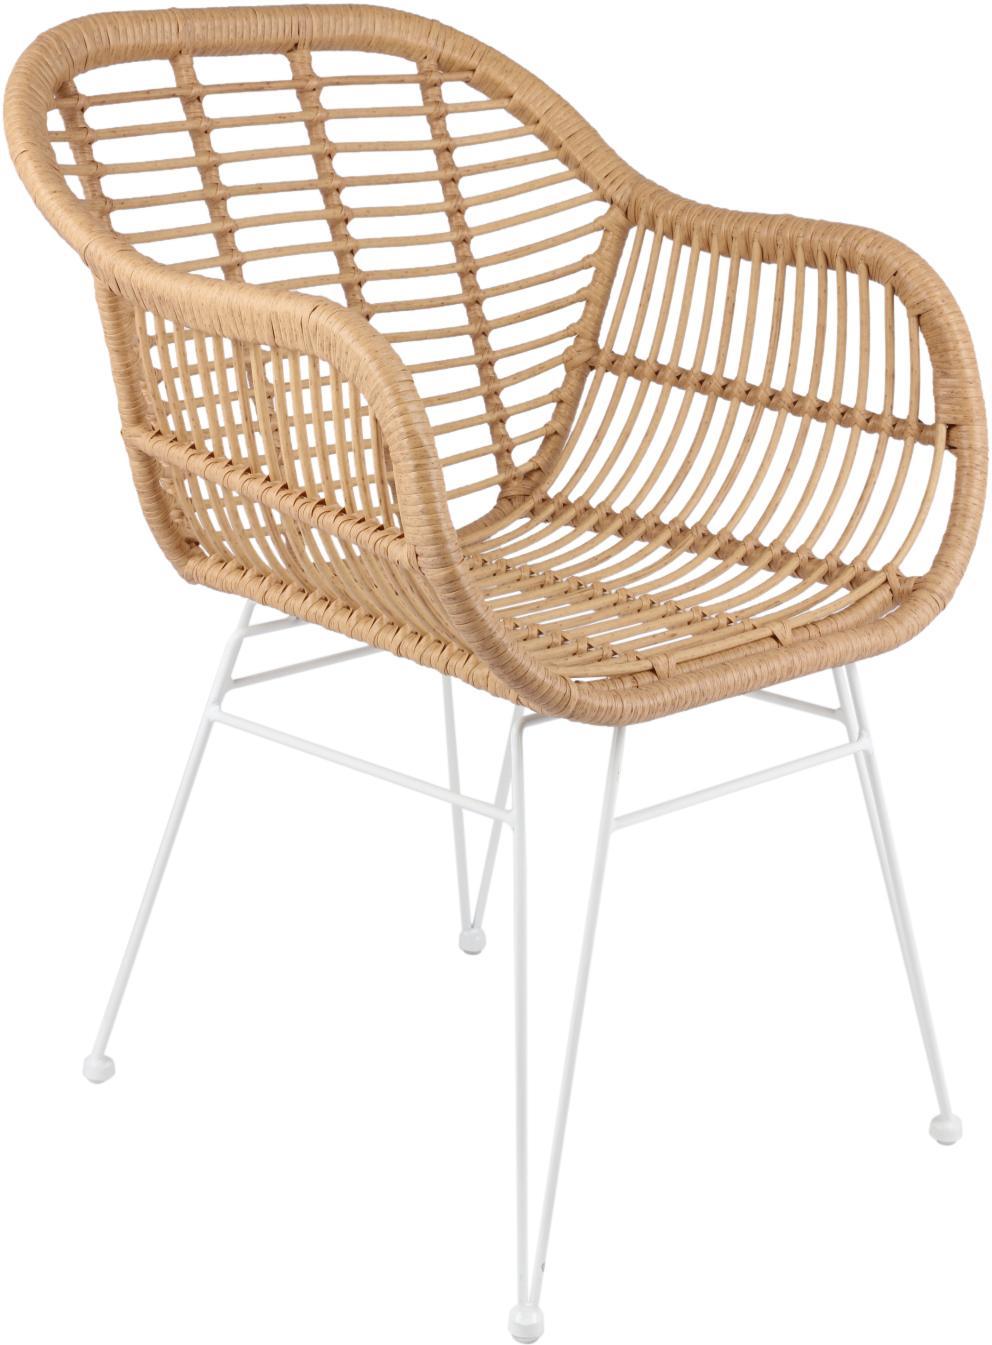 Polyrattan-Armlehnstühle Costa, 2 Stück, Sitzfläche: Polyethylen-Geflecht, Gestell: Metall, pulverbeschichtet, Hellbraun, Beine Weiss, B 59 x T 58 cm